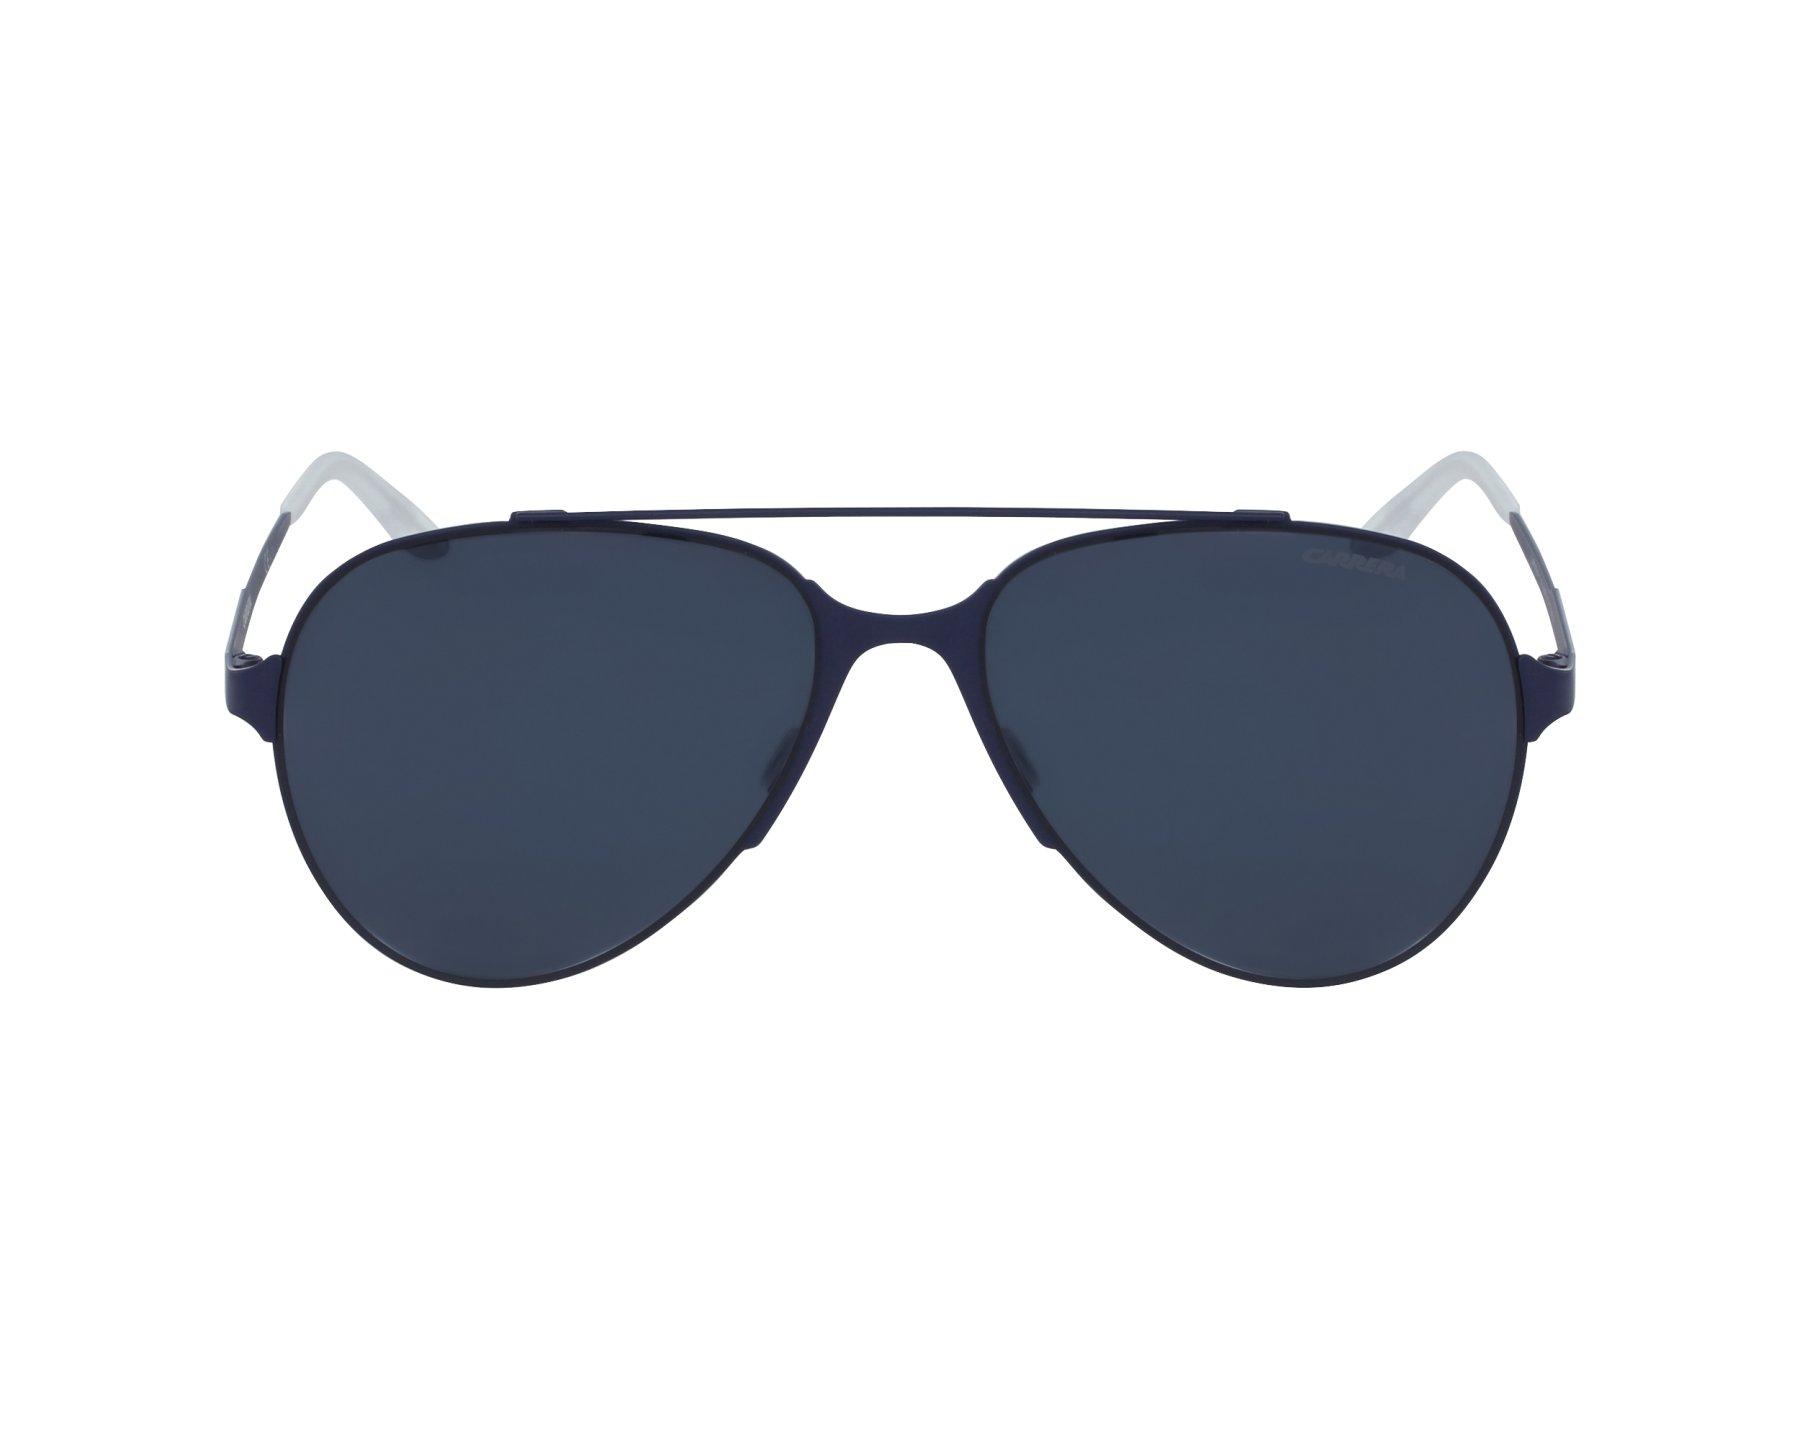 903d3a76236 Sunglasses Carrera CARRERA-113-S D6K KU 57-17 Blue profile view